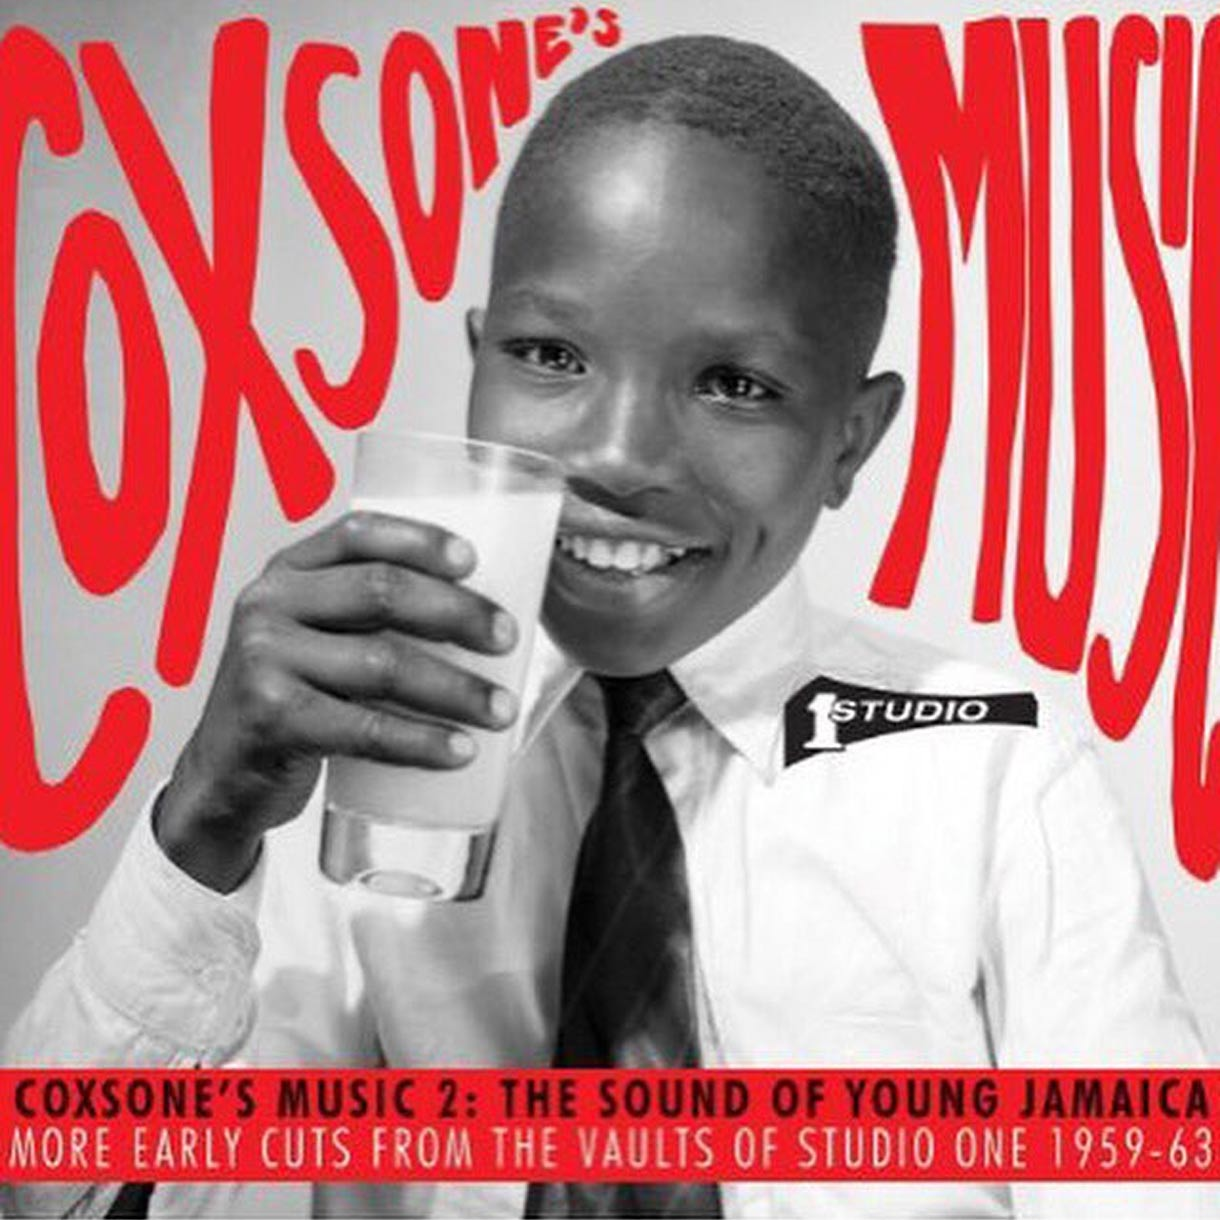 Coxsone-s-Music-2-The-Sound-Of-Young-Jamaica-cd-lp-vinile-vinyl-semmstore.com-semm-semmmusic-record-store-music-store-semmstore